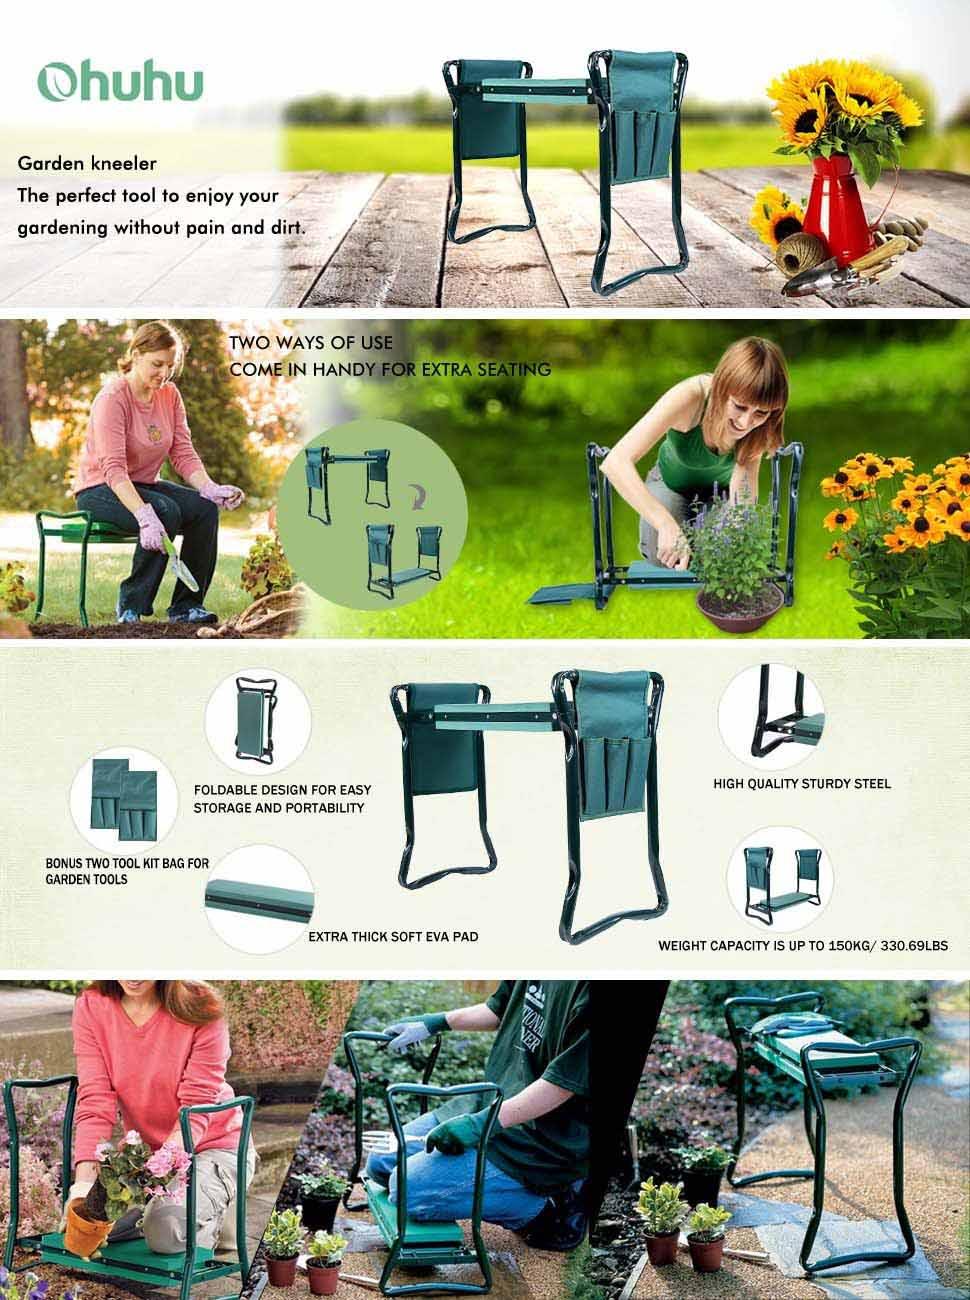 Amazon.com : Ohuhu Garden Kneeler and Seat with Bonus Tool